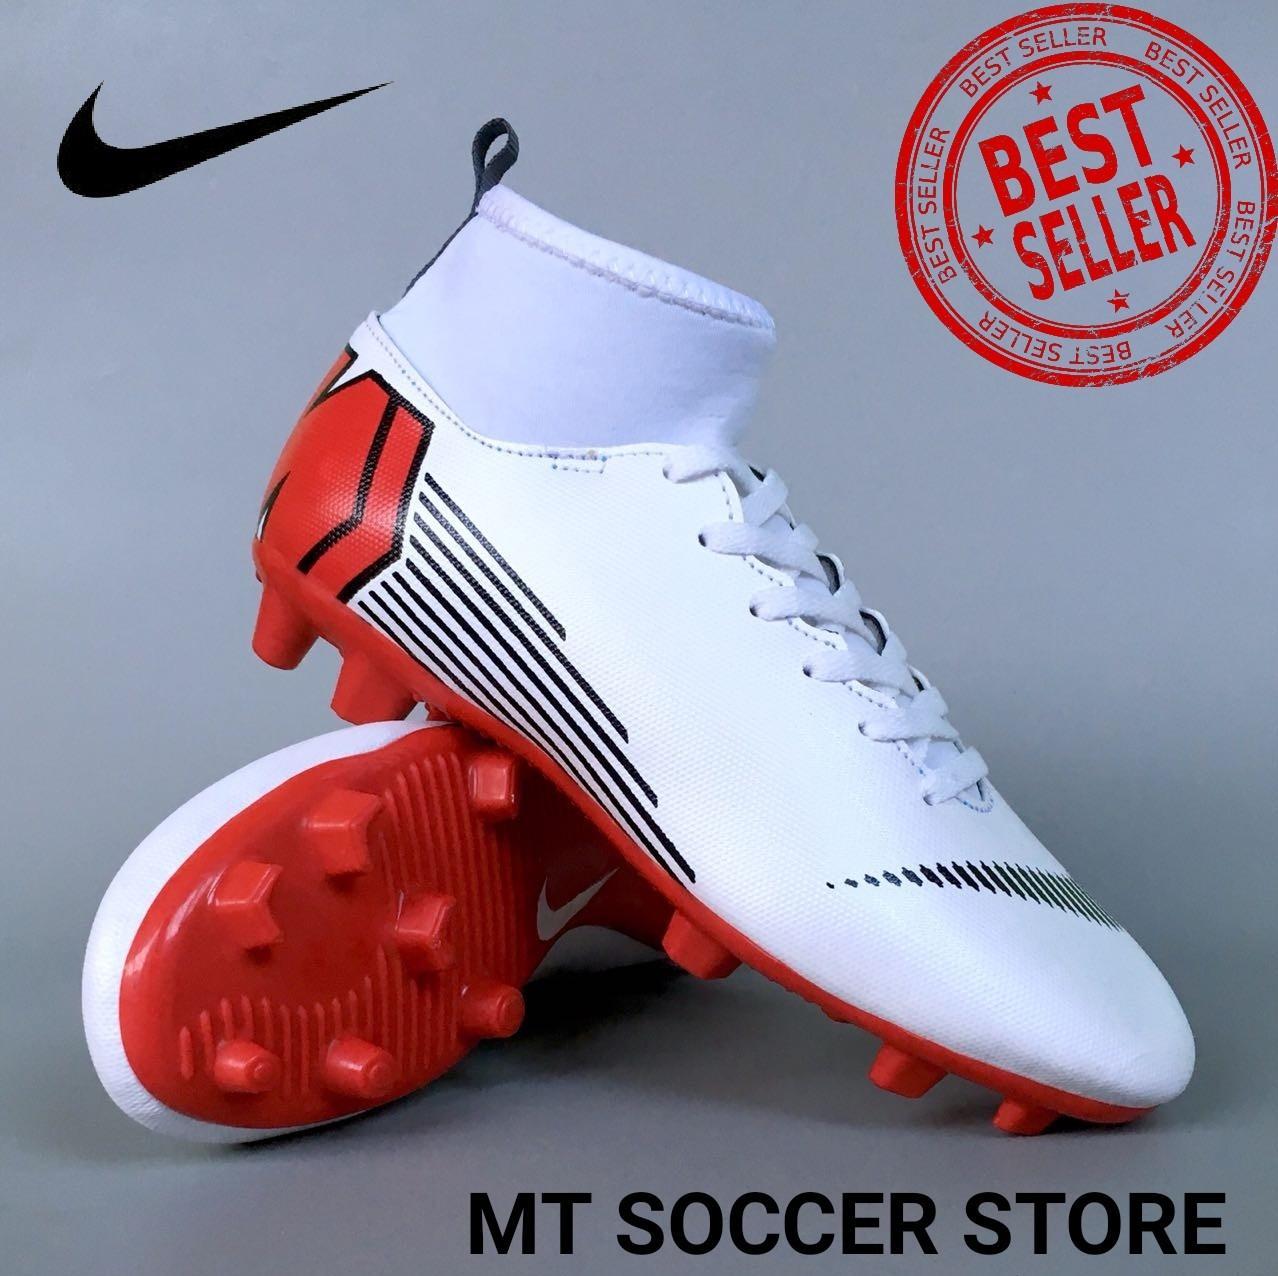 Catenzo Football Shoes Sepatu Sepakbola Pria Black - Daftar Update Harga  Terbaru Indonesia. Source · ba9a67f596